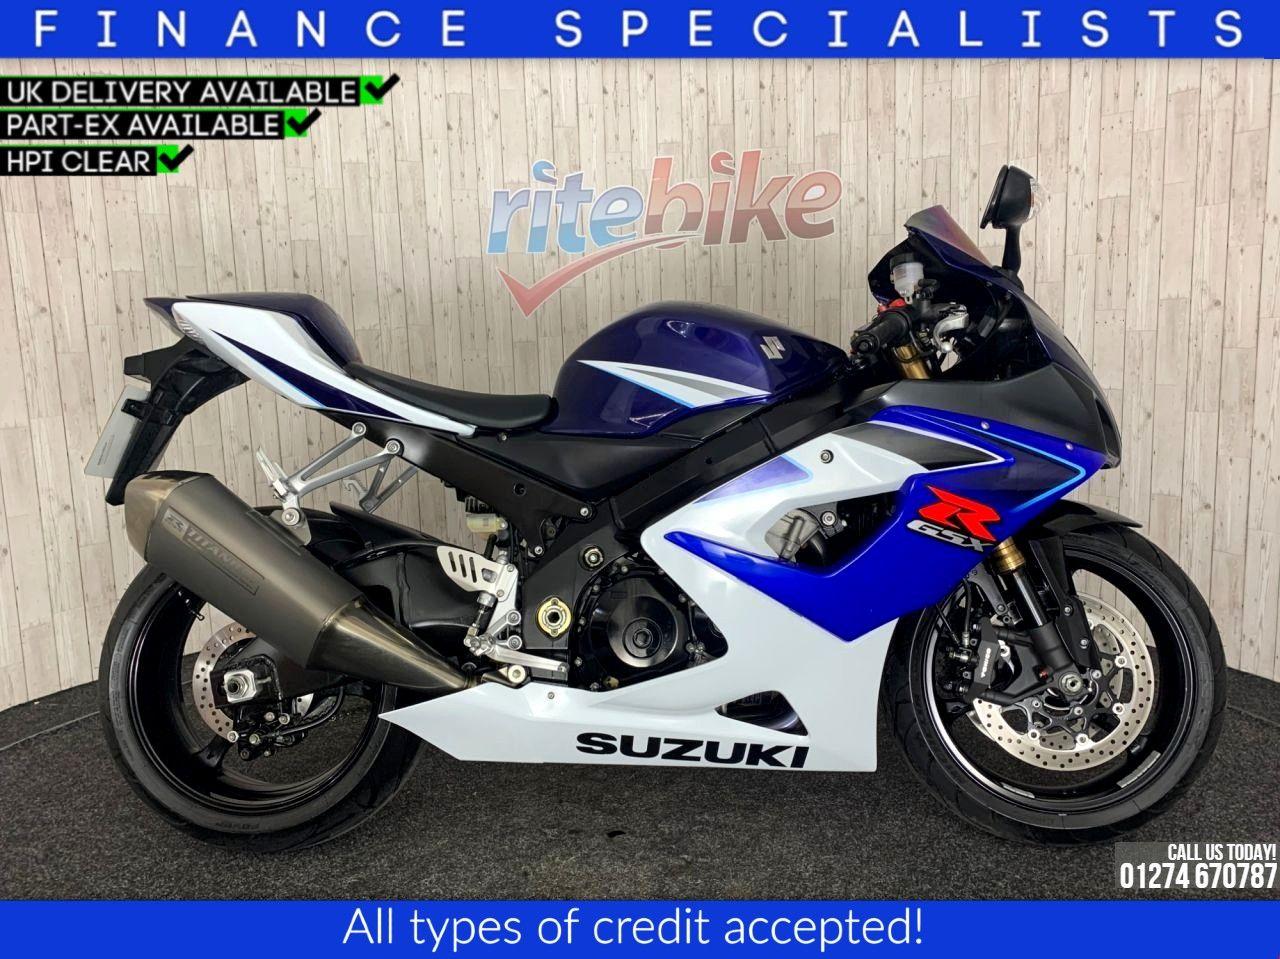 SUZUKI GSXR 1000 in 2020 Suzuki gsxr1000, Suzuki, Suzuki